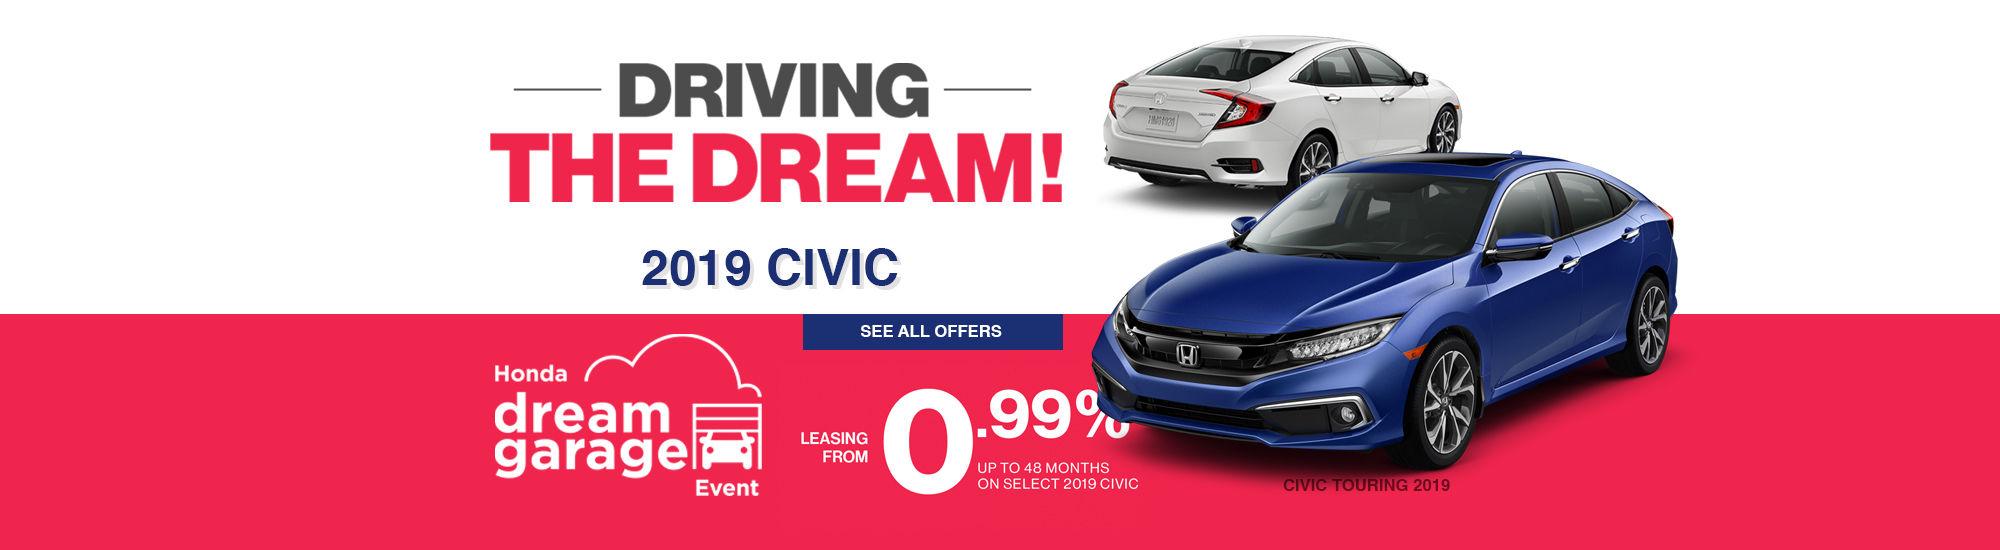 Honda Driving the dream